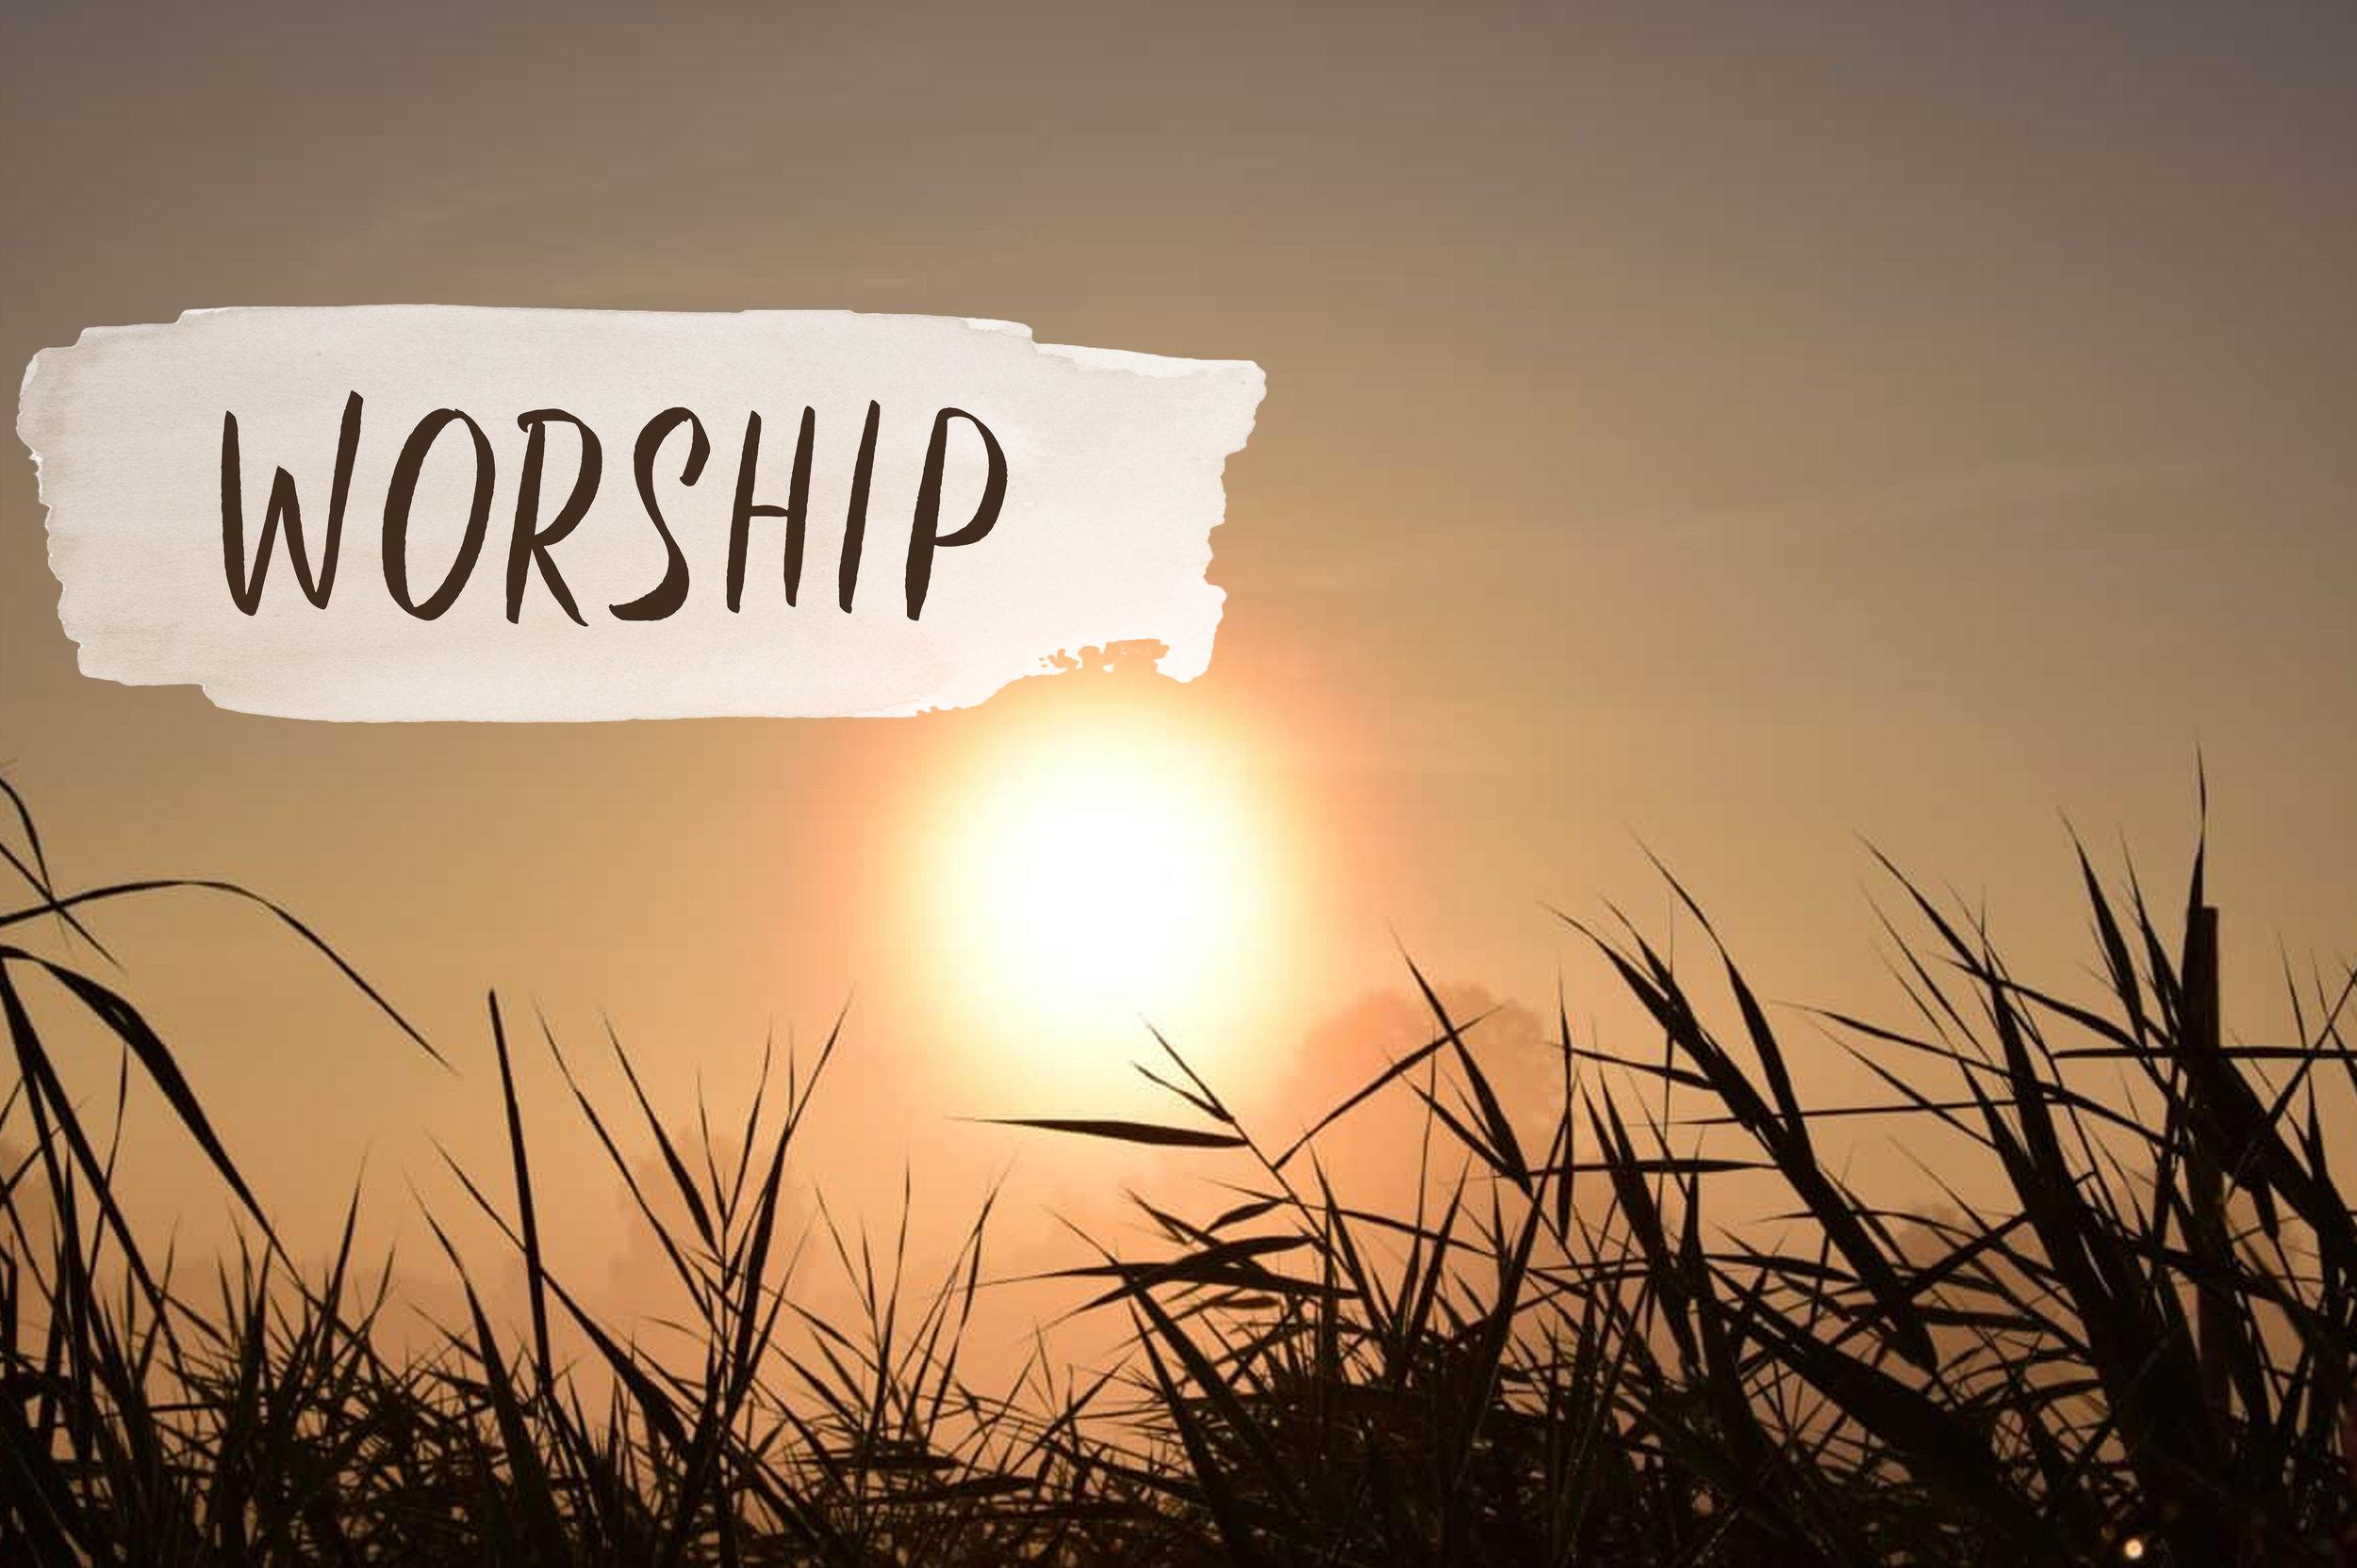 Worship11.jpg